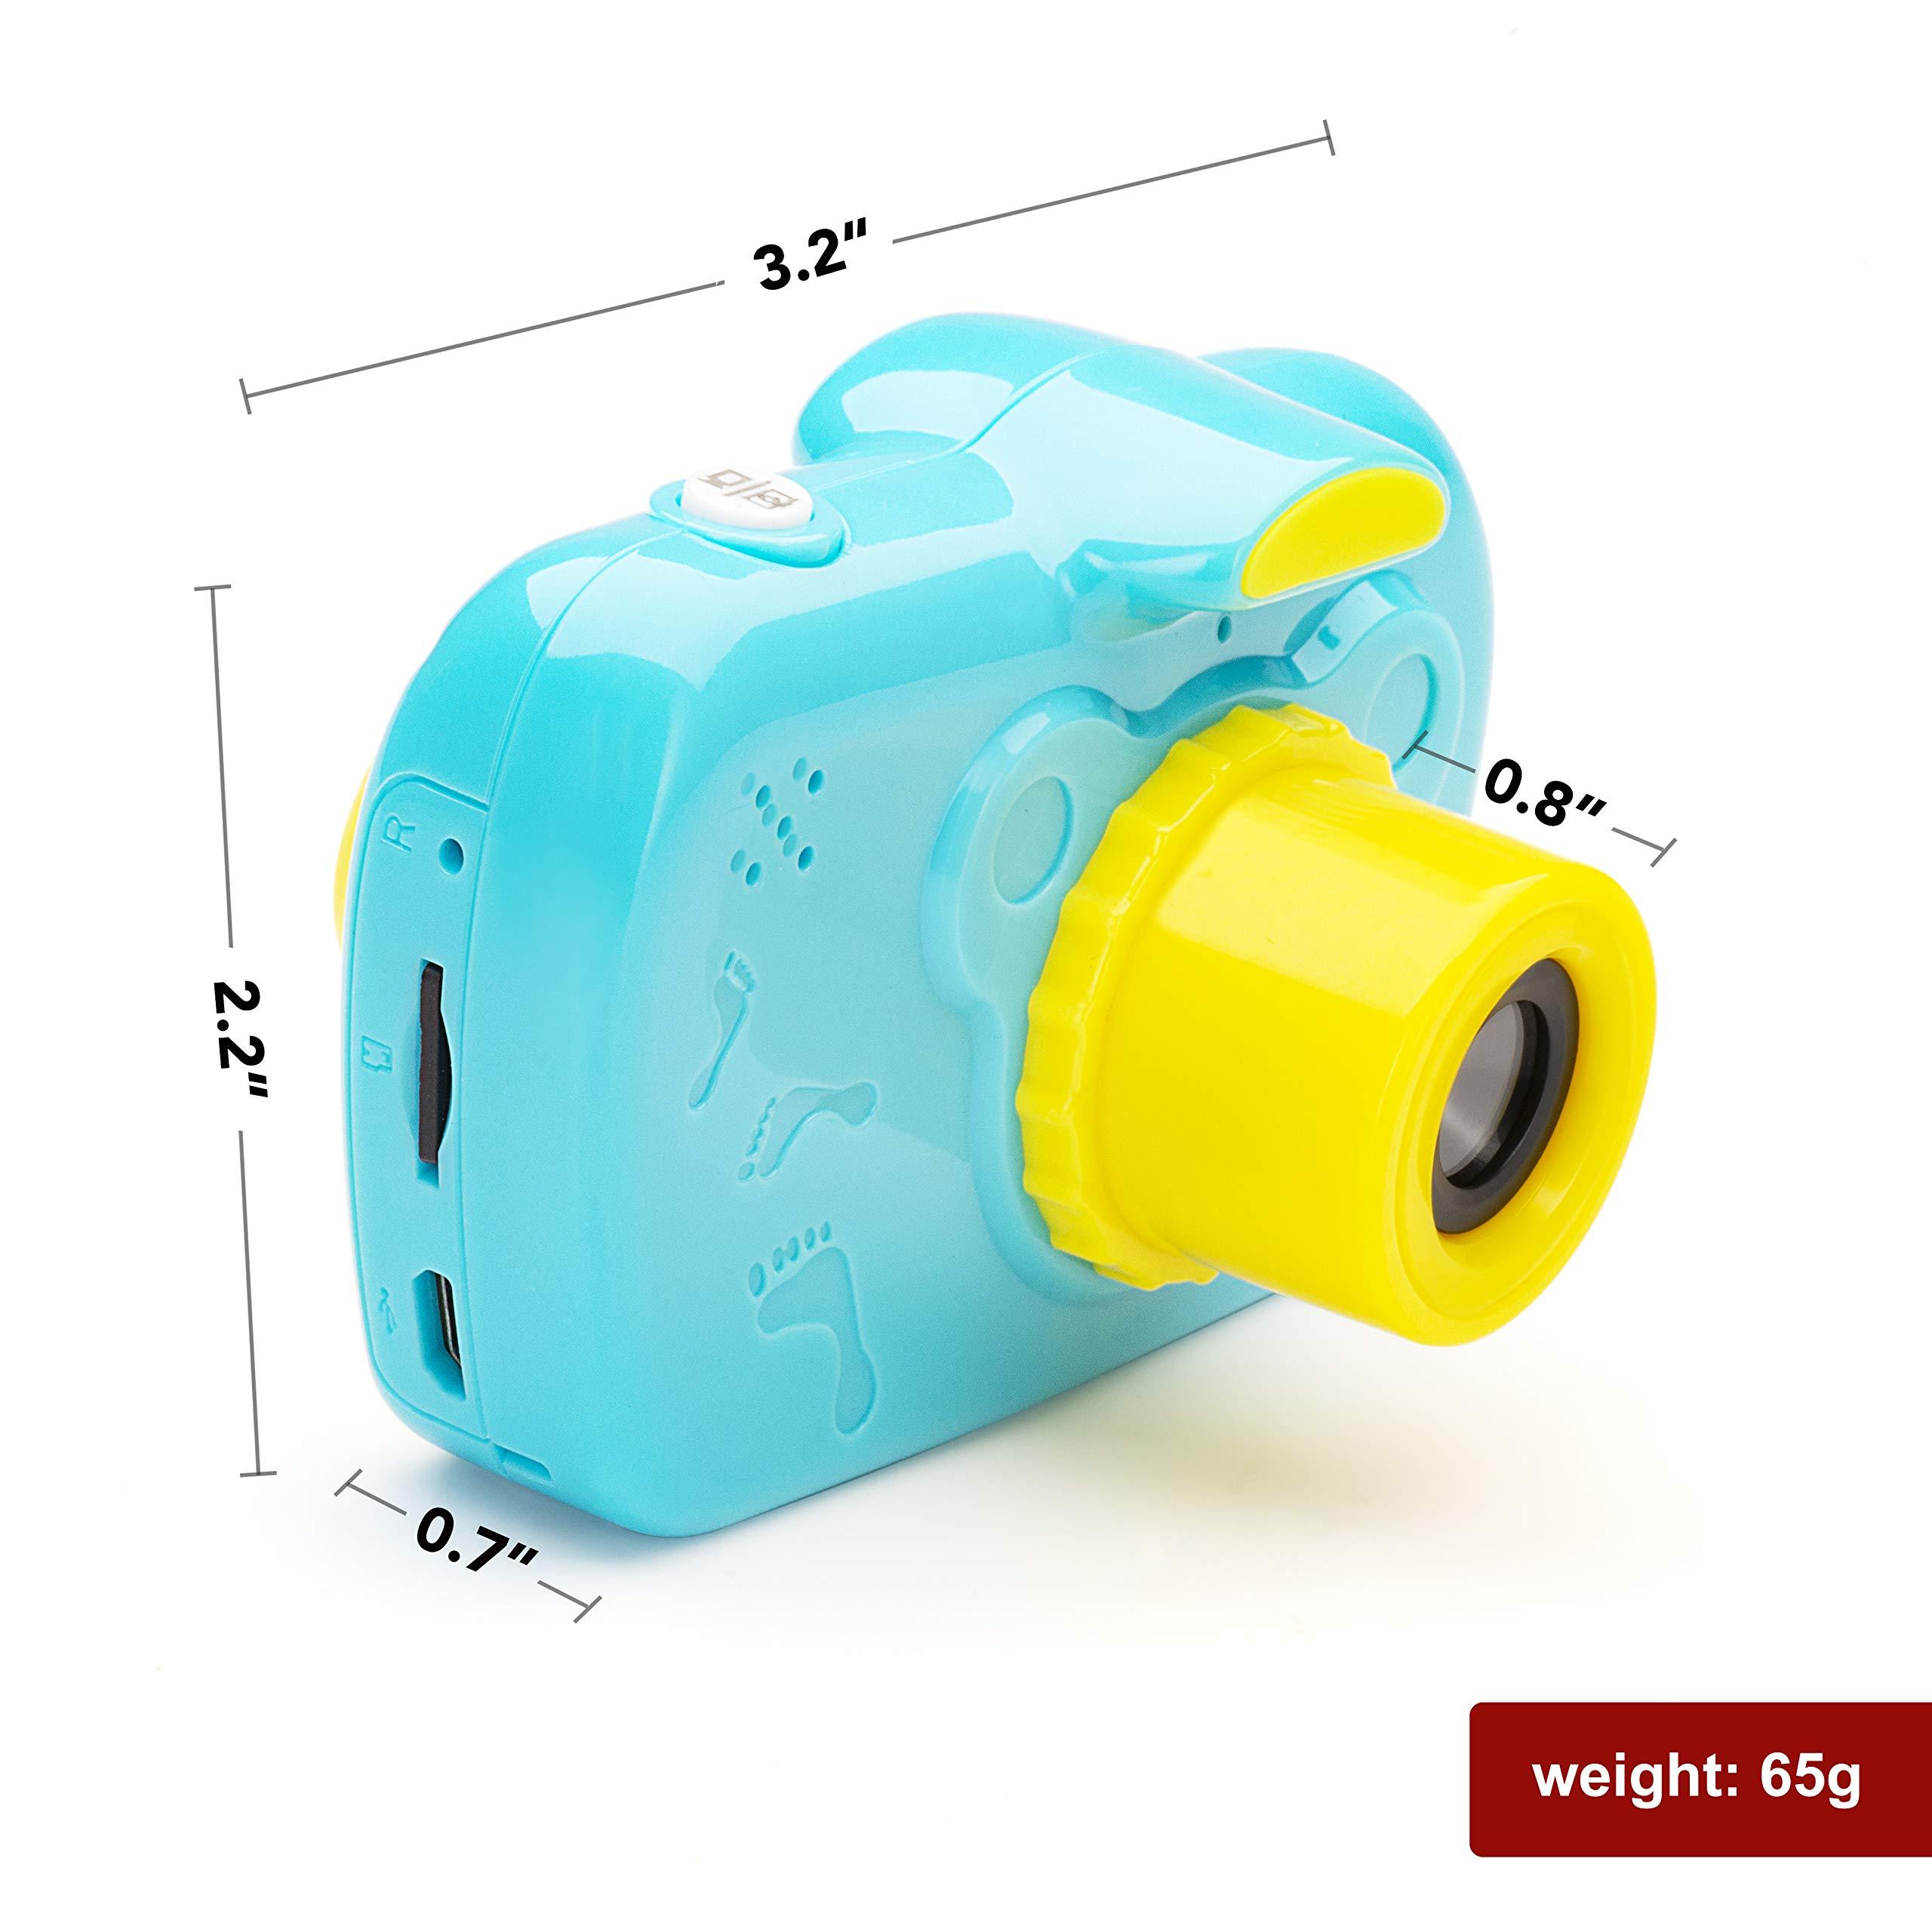 SIKVIO Mini 2.0 Inch Screen Kids Childrens Digital Camera,1080P HD Mini Digital Video Recorder Camcorder Camera with Loop Recording 16GB Cards for Boys Girls by SIKVIO (Image #8)